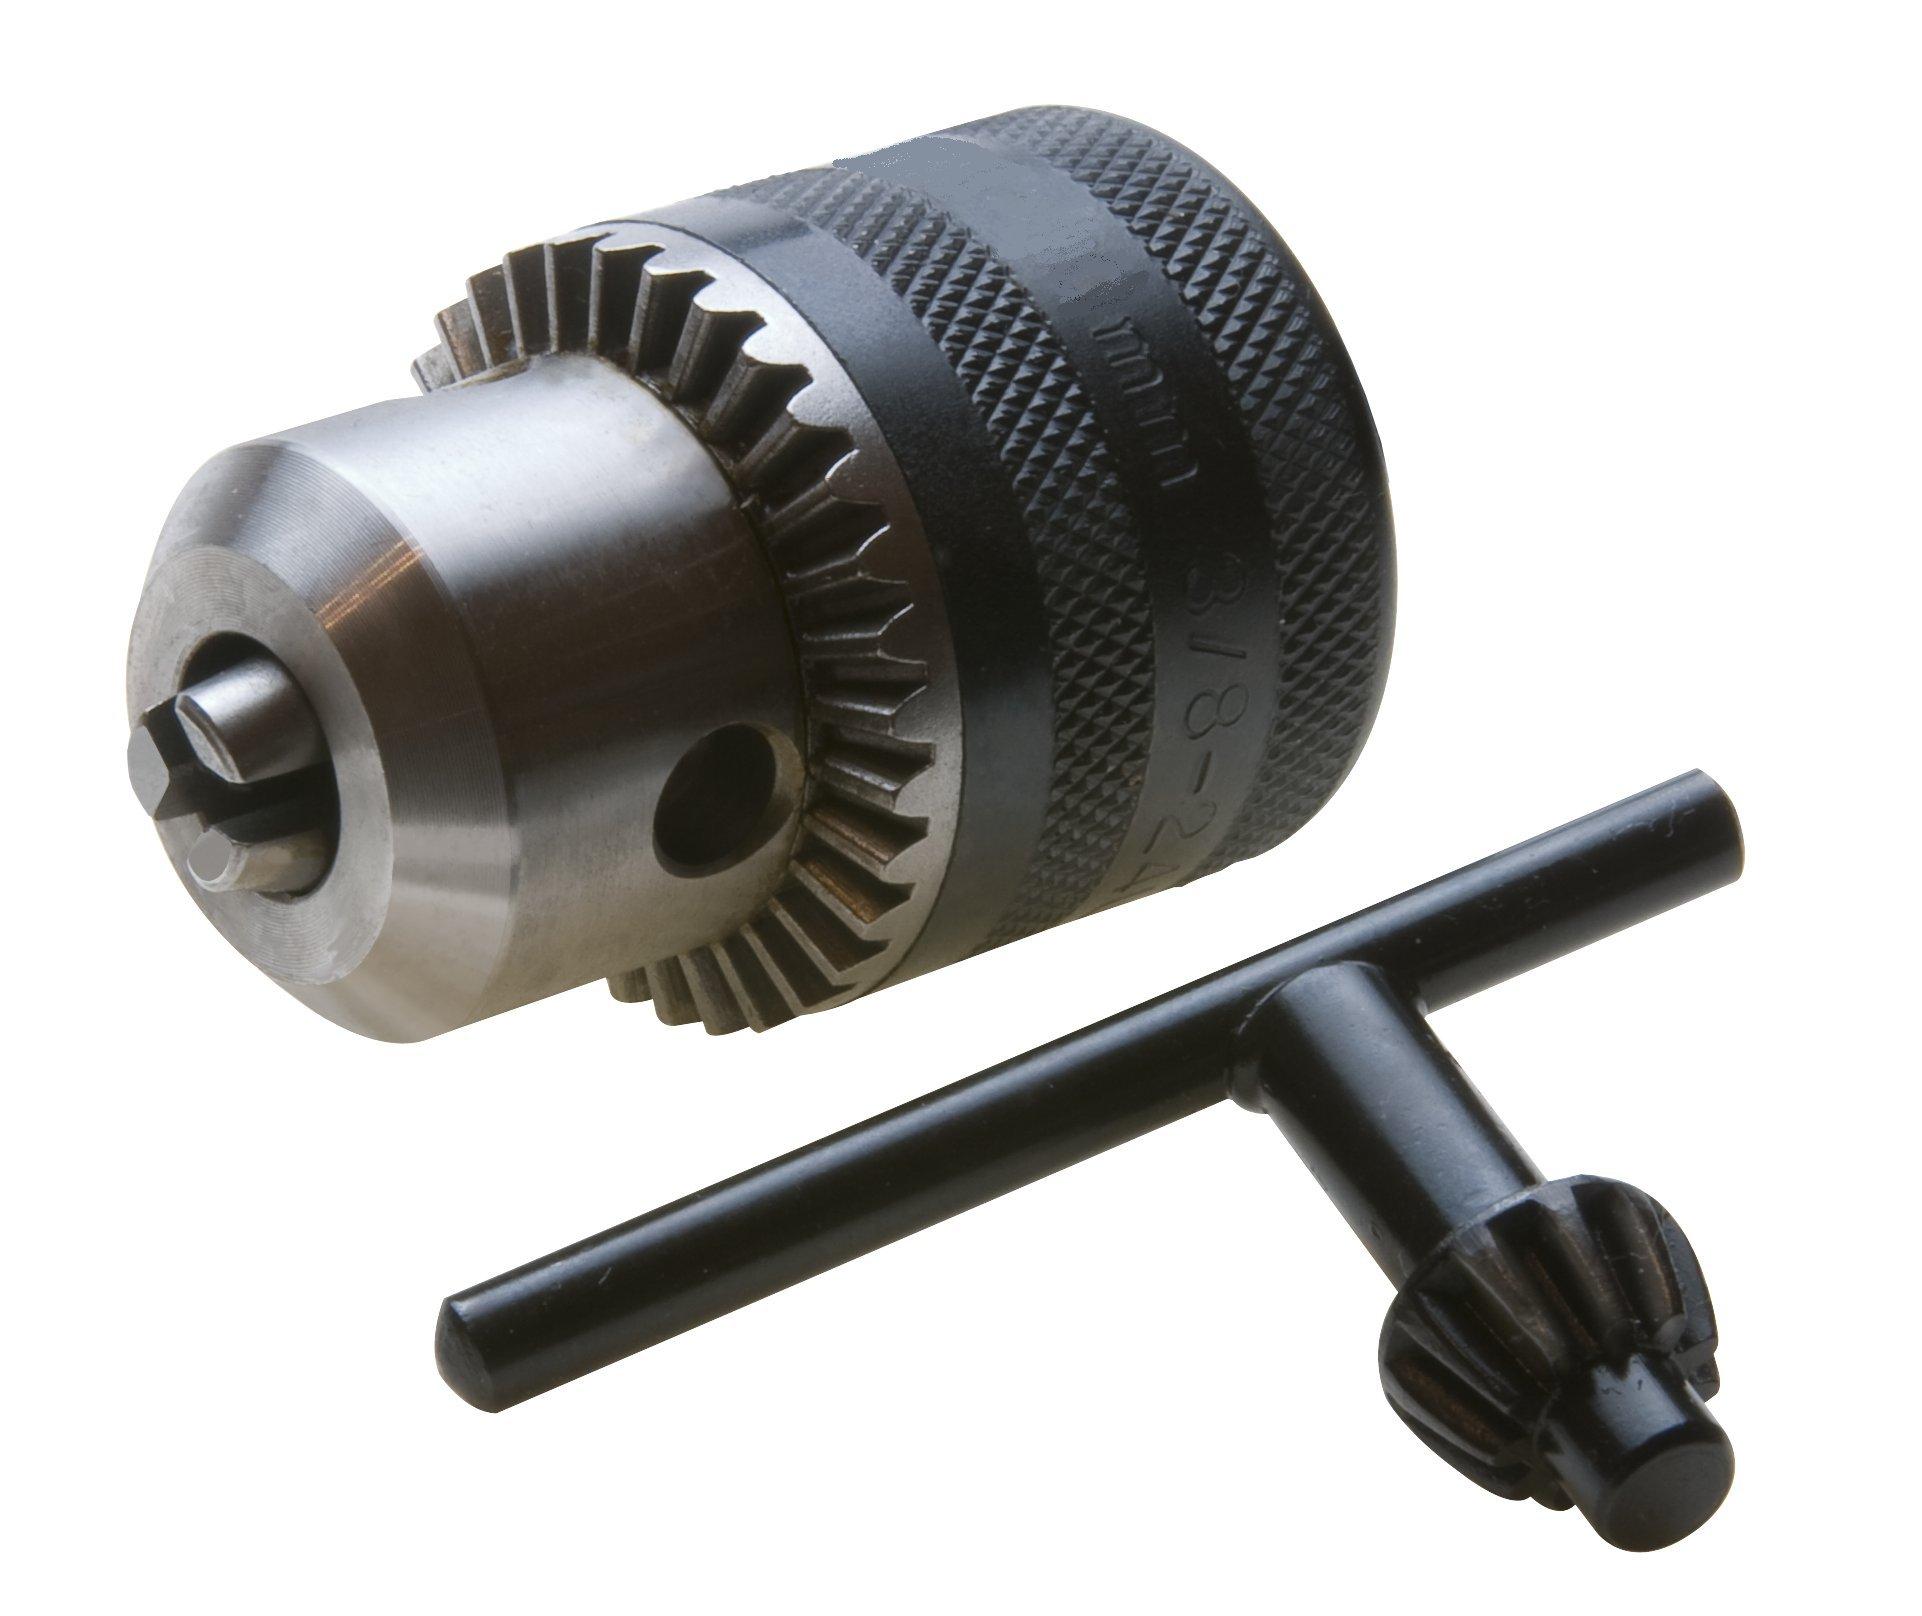 LFA/Reichel Hardware 4220AO 1/16-1/2-1.5-13 mm Capacity 3/8-24'' Threaded Mount Keyed Light Duty Drill Chuck